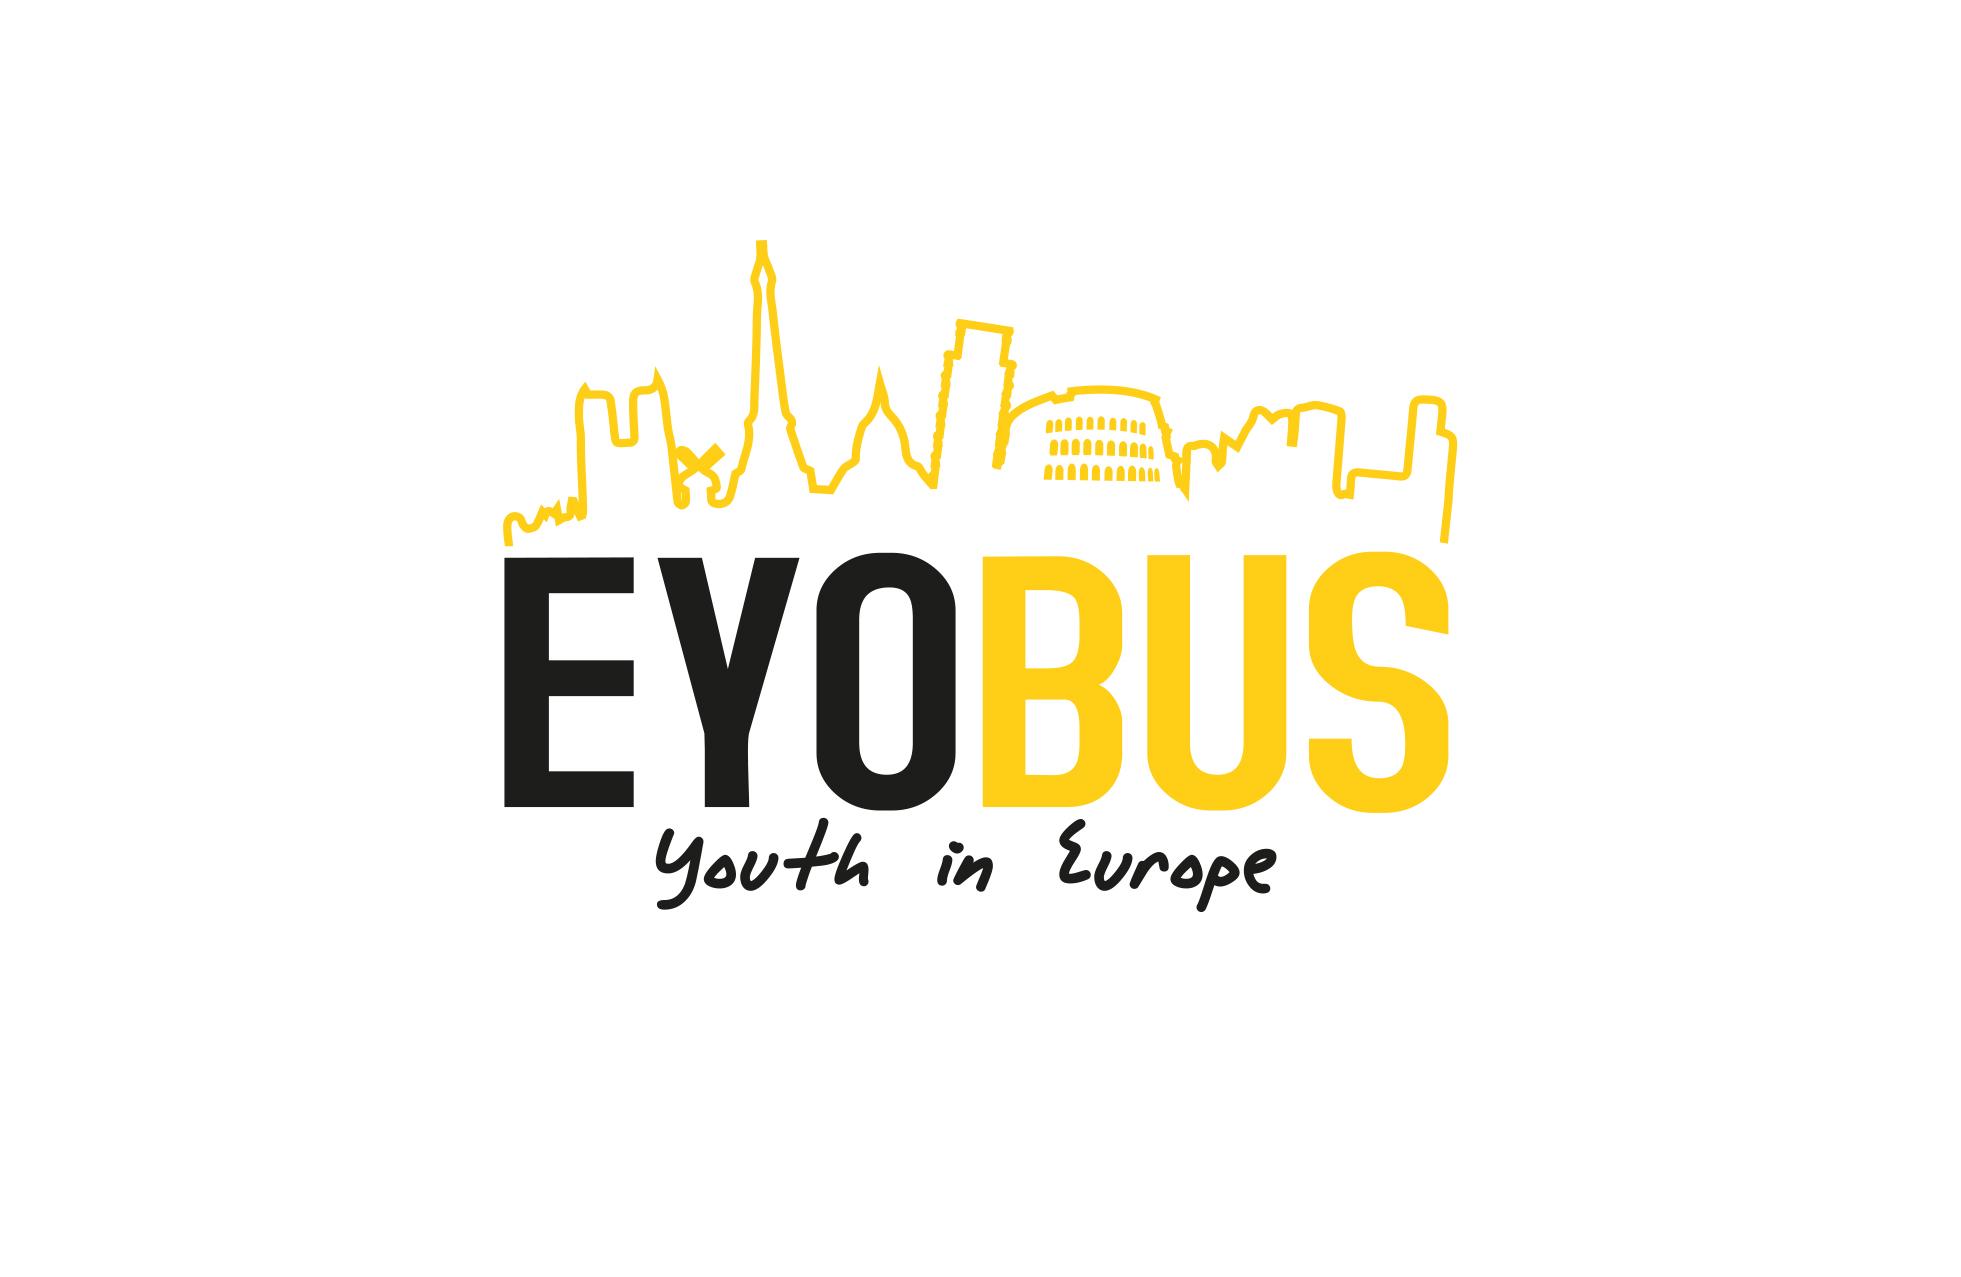 Eyobus